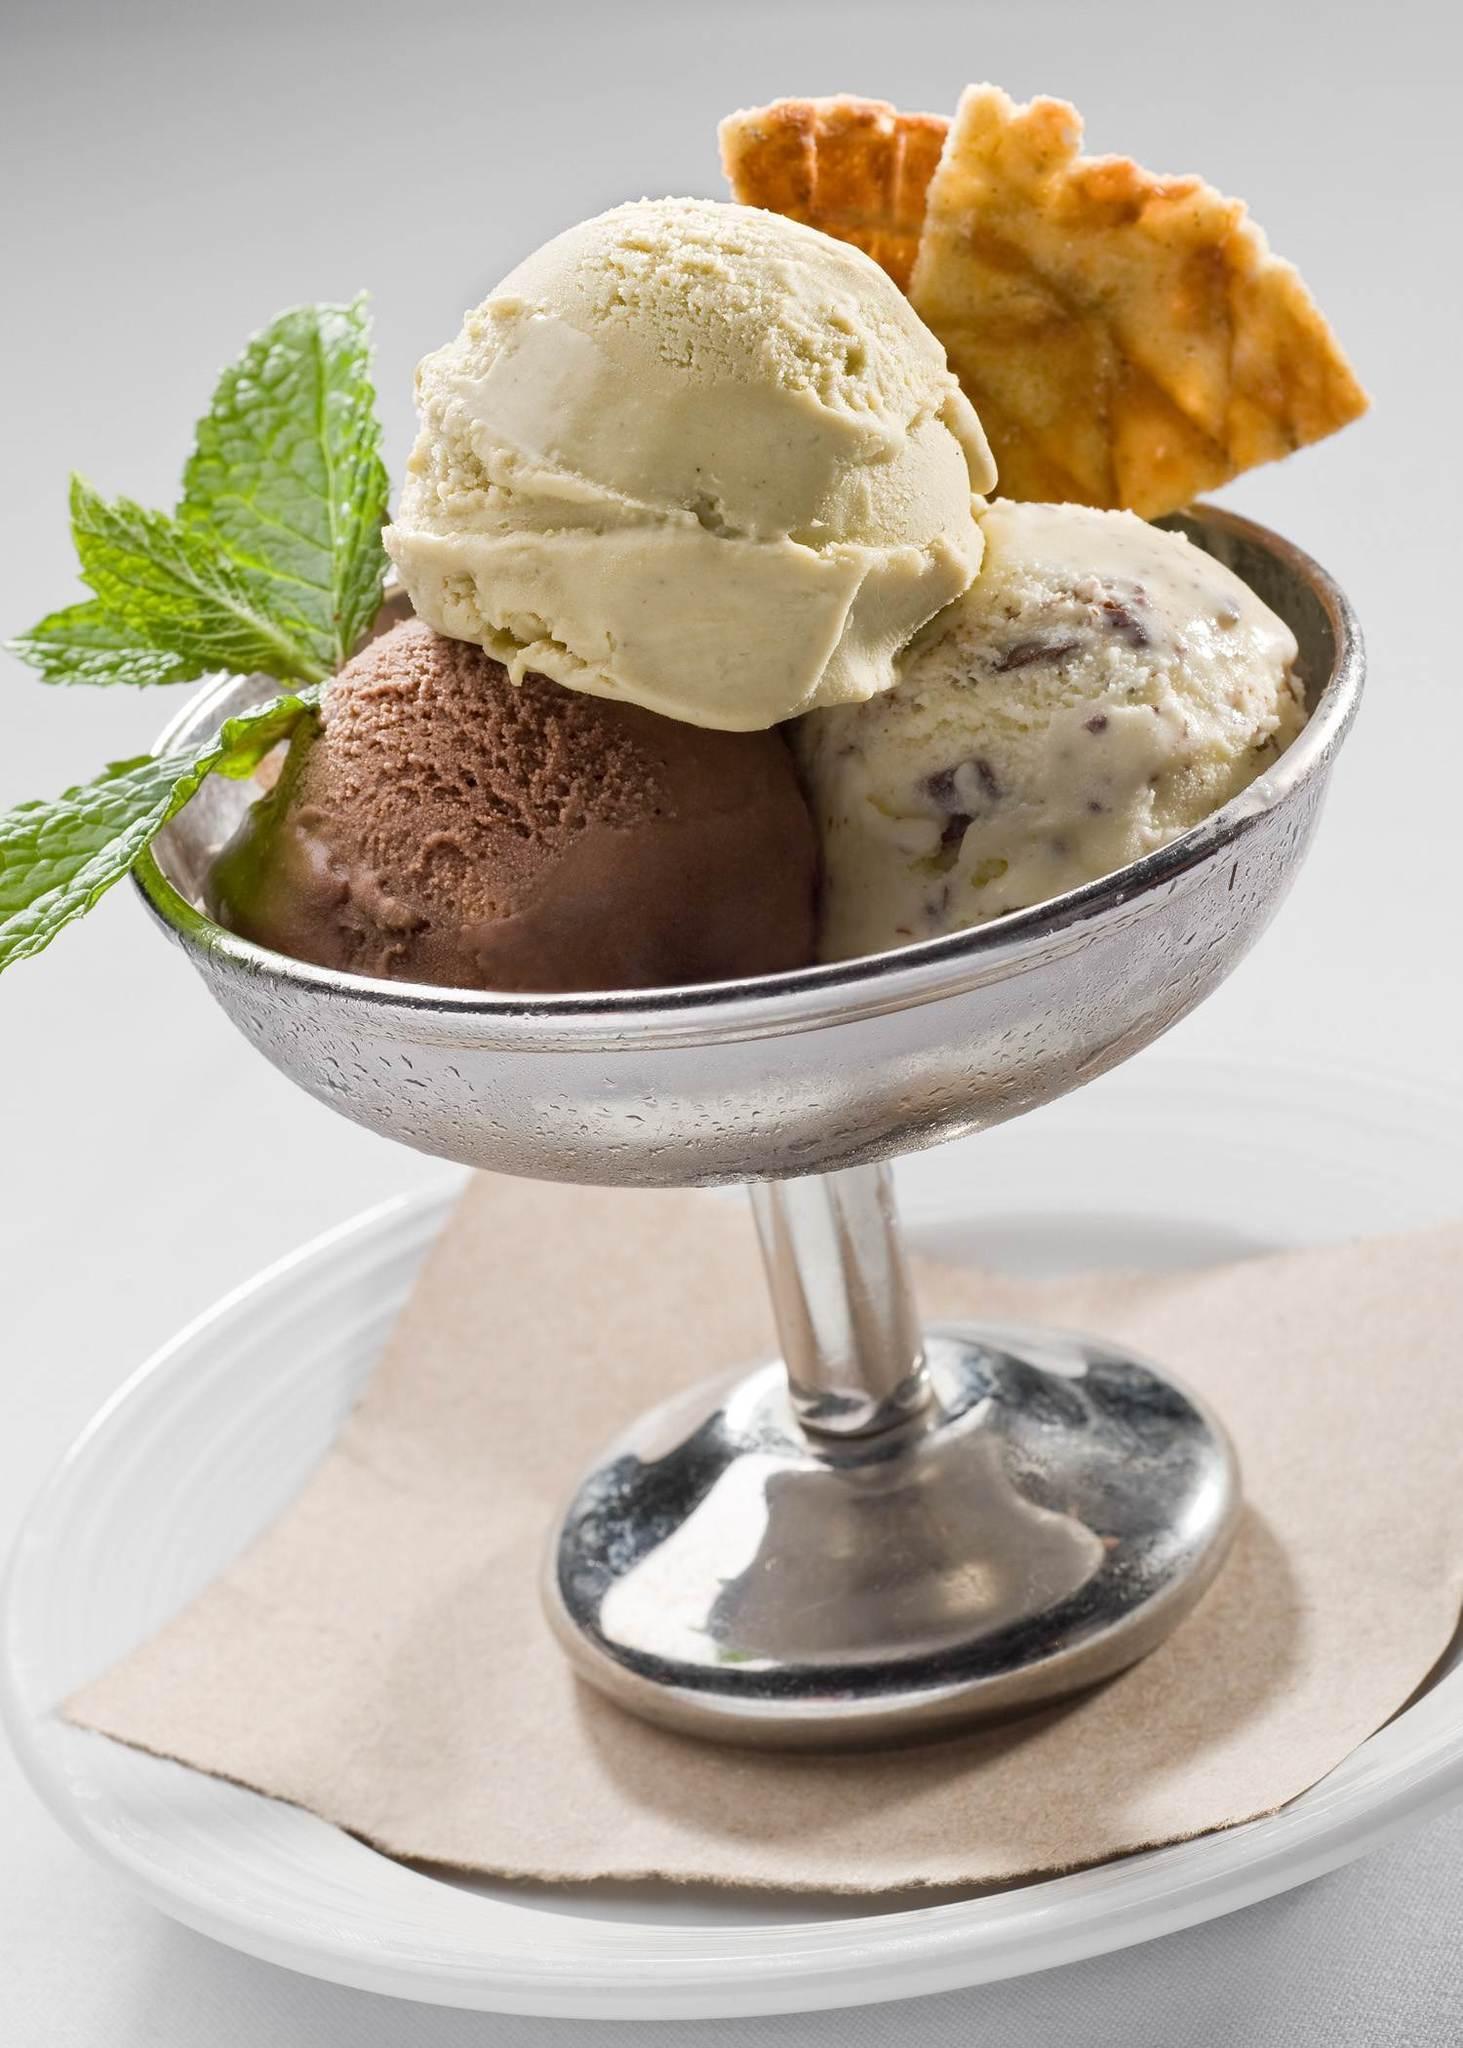 Десерт — википедия переиздание // wiki 2